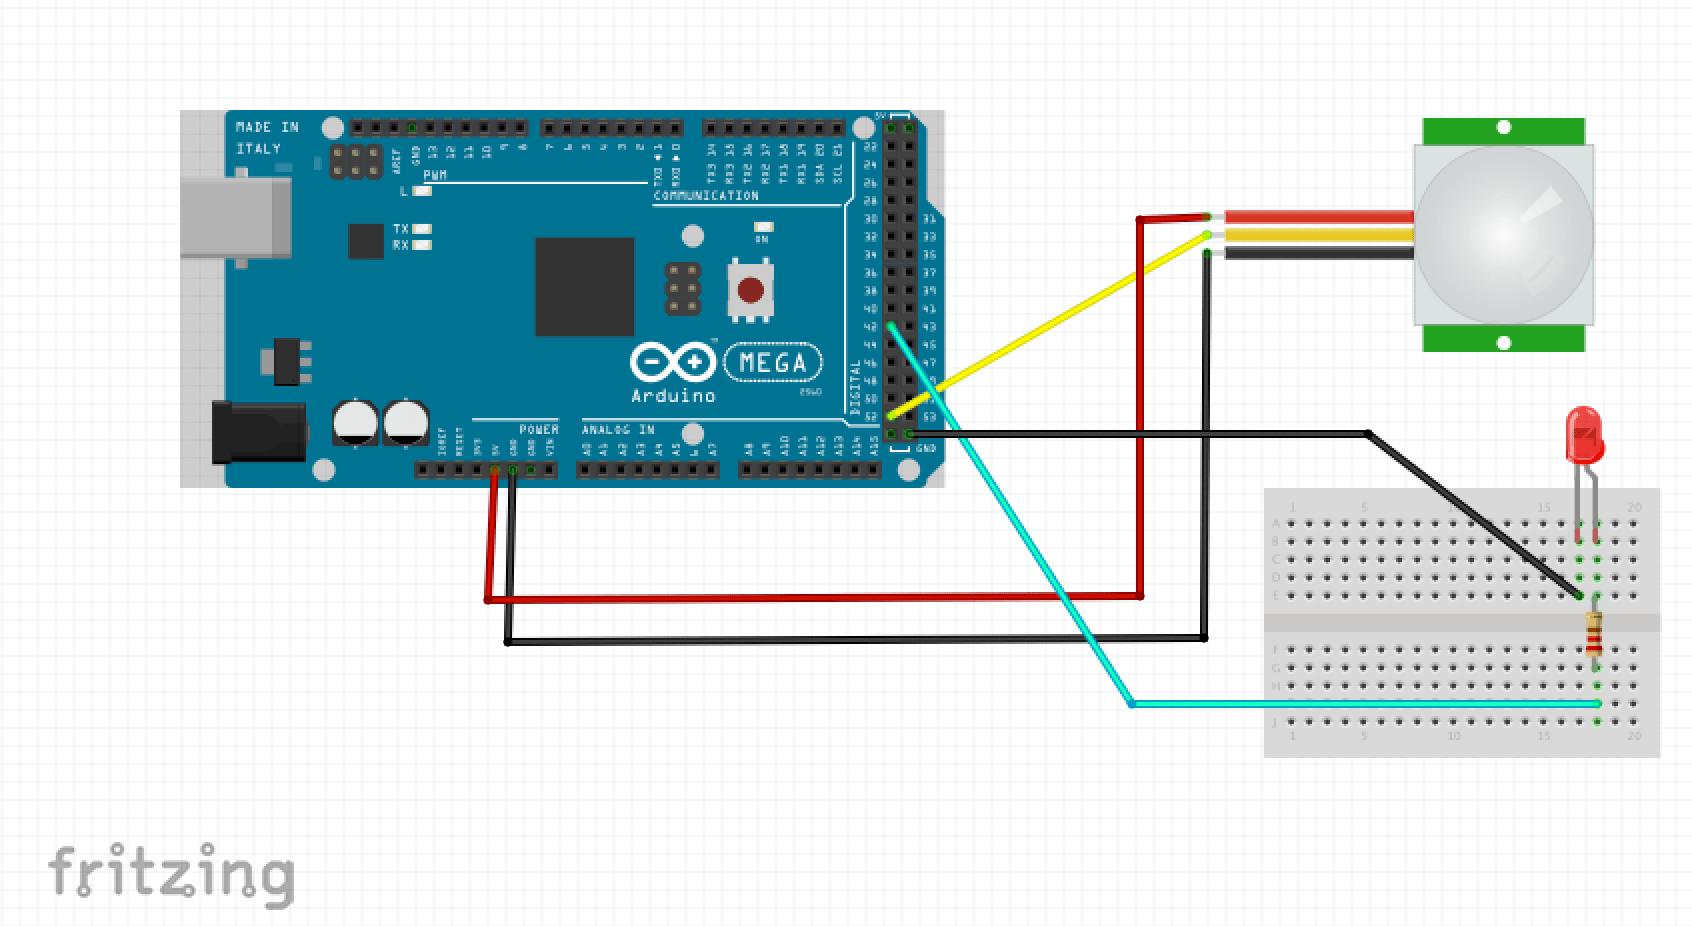 Pir Sensor Wiring Diagram Pir Sensor Wiring Diagram Pir Motion Sensor